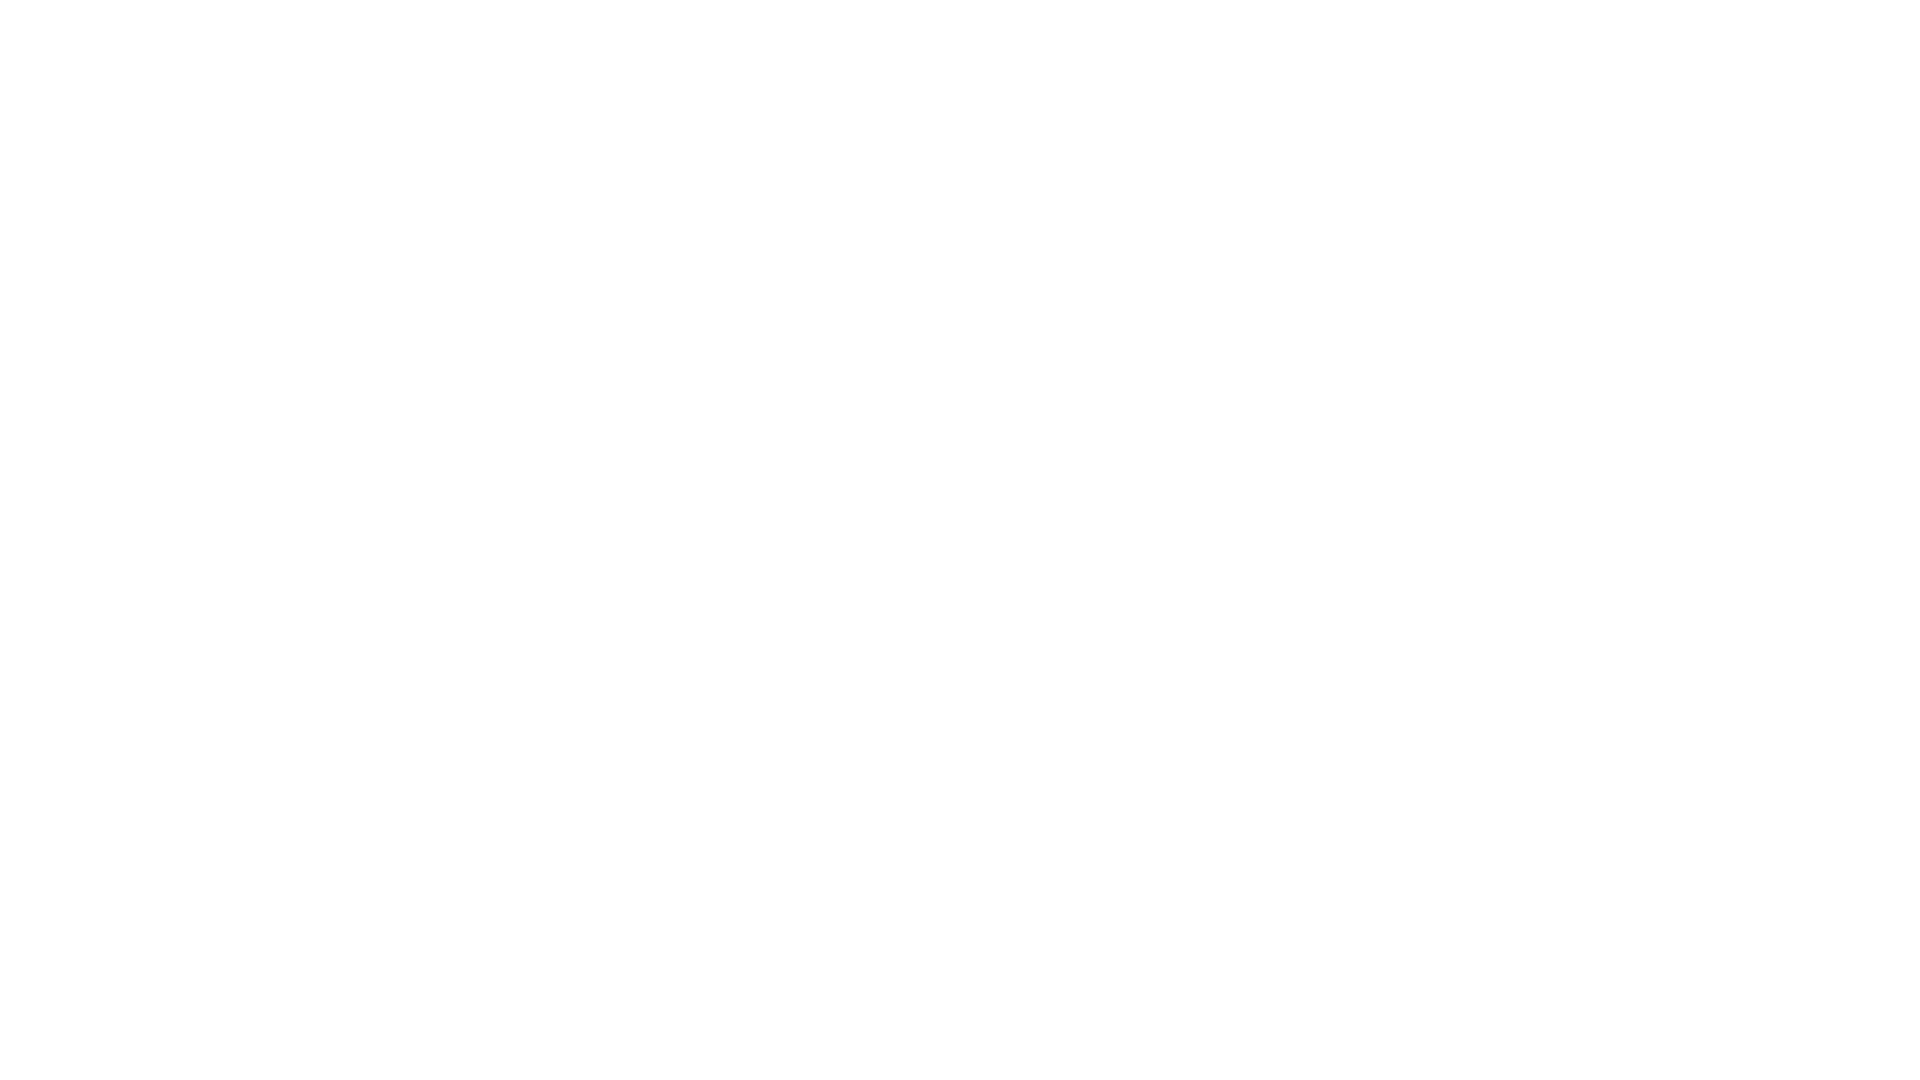 uGent